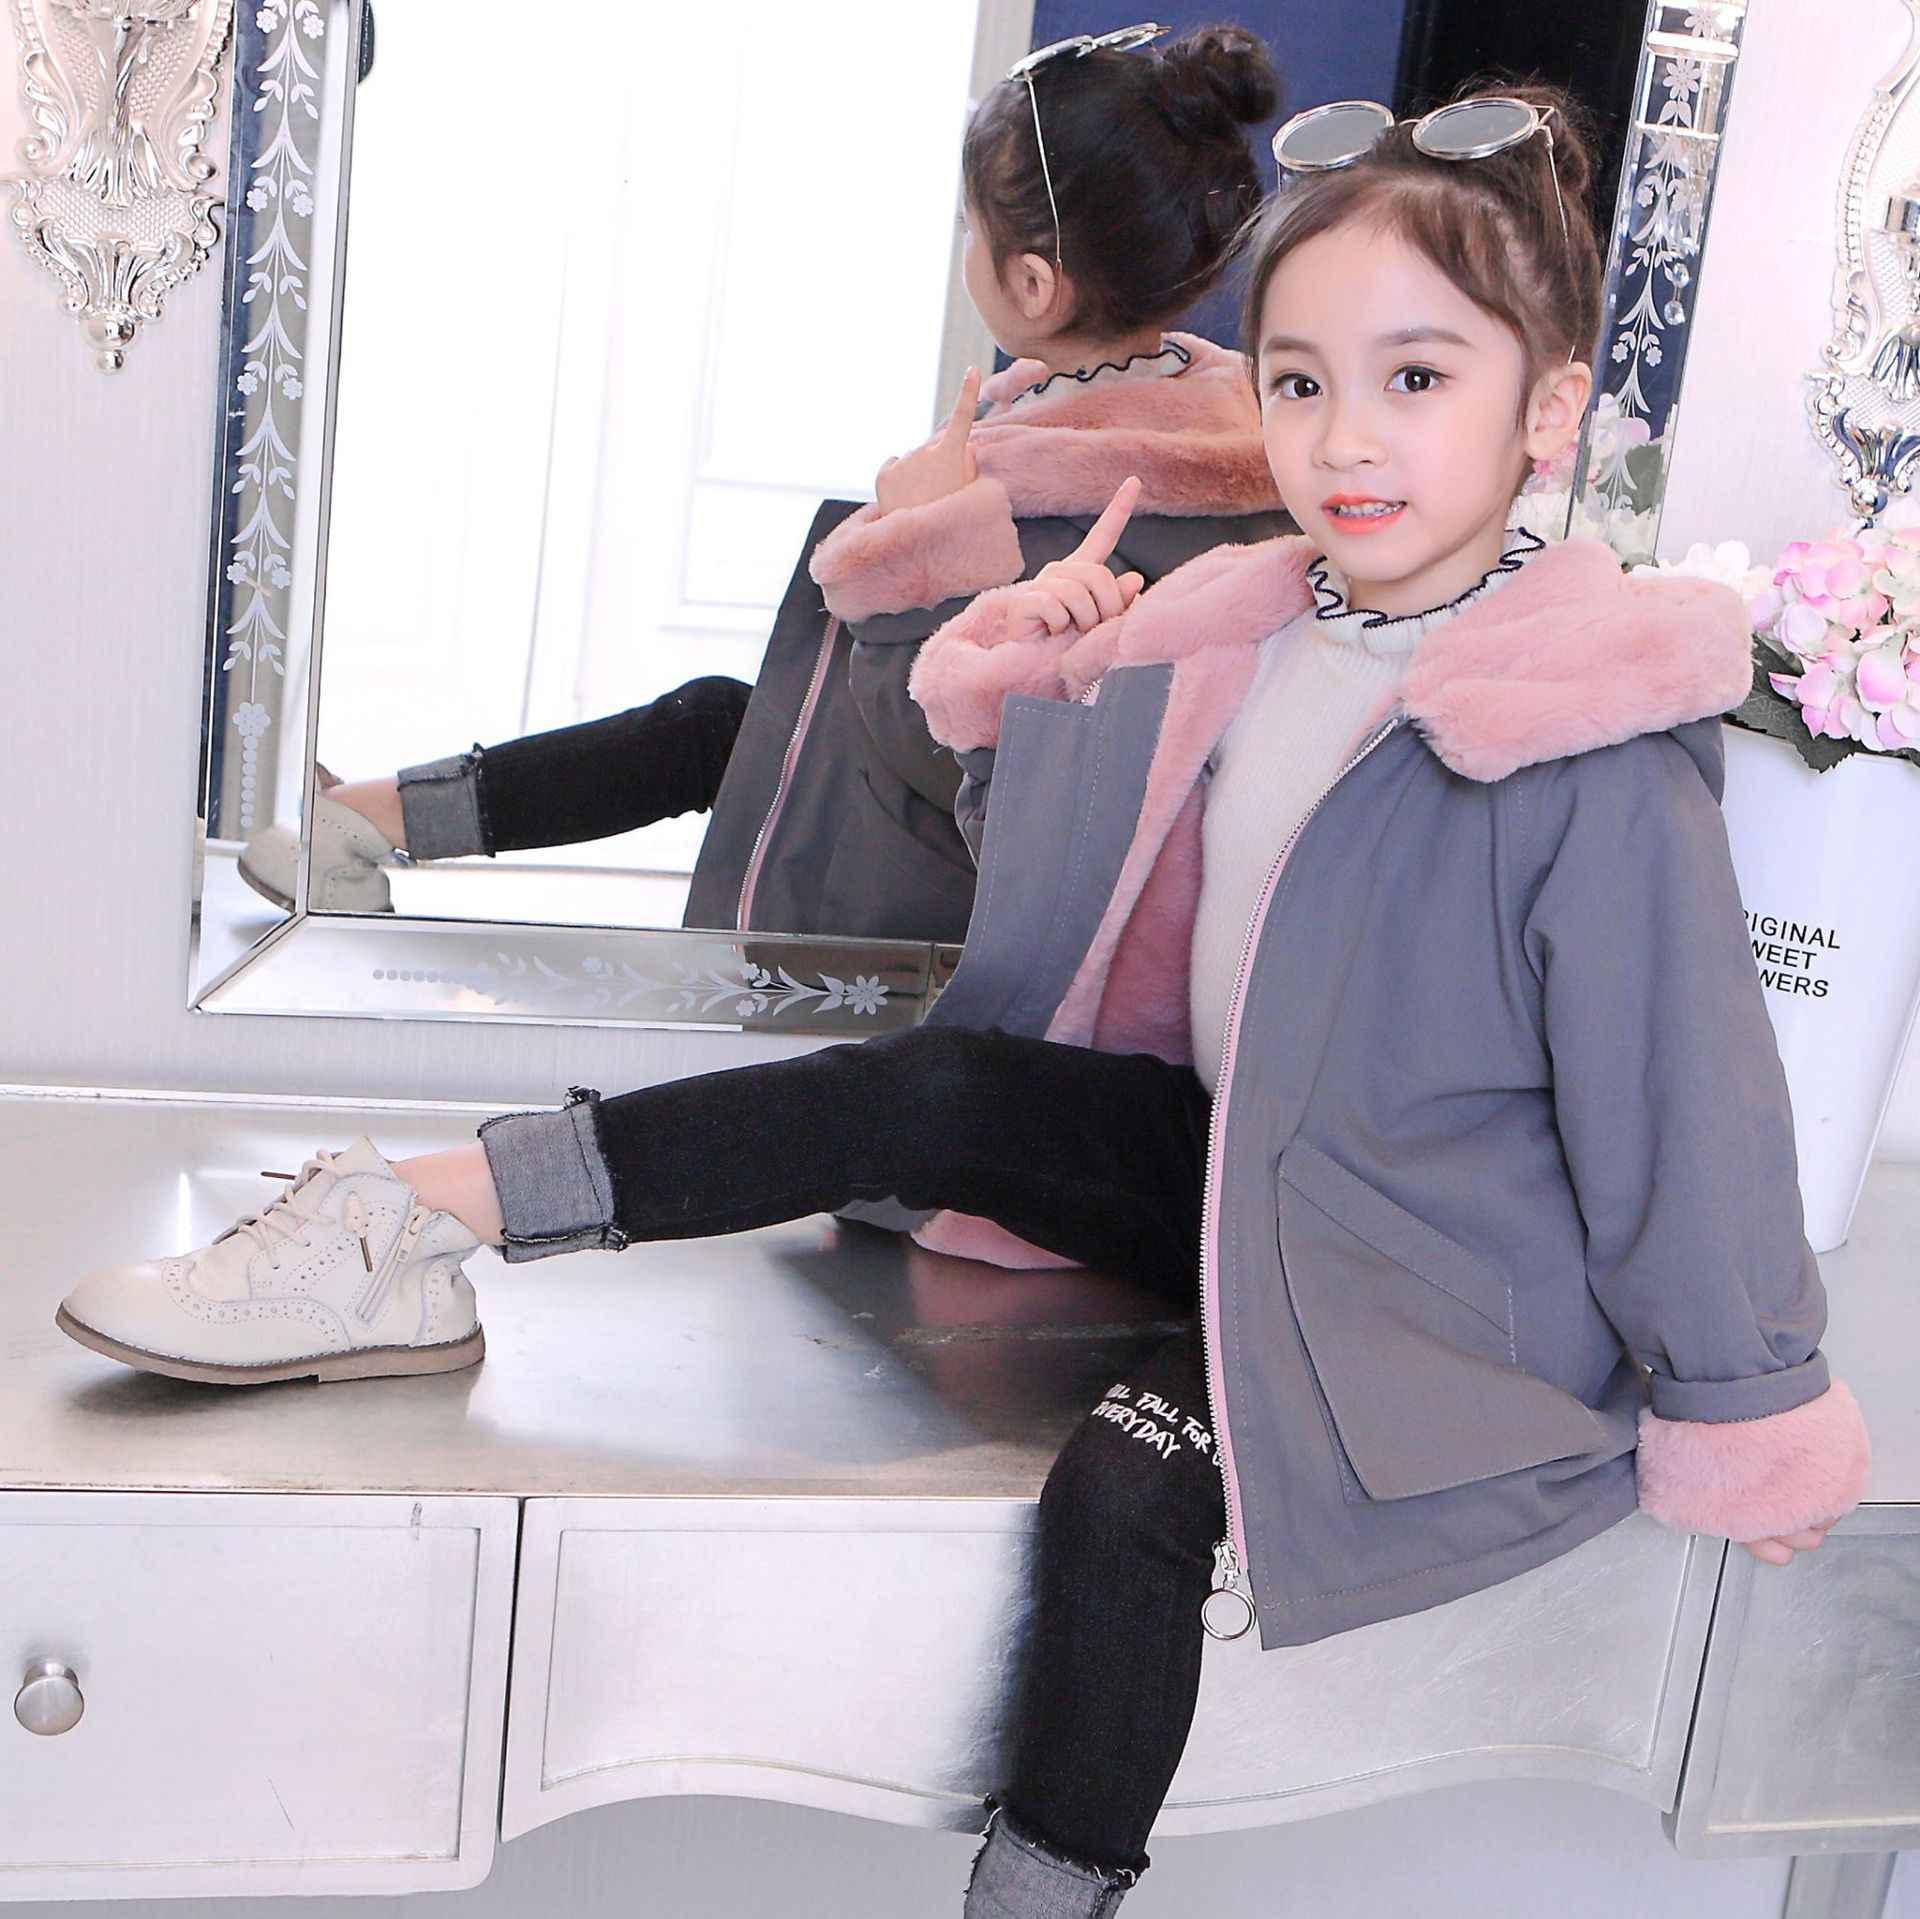 Bayi Gadis Pakaian 2020 Baru Musim Dingin Menebal Mantel Wanita Anak-anak Panjang Ke Bawah Jactet anak Wol Berkerudung Snowsuit Bulu Imitasi pakaian luar